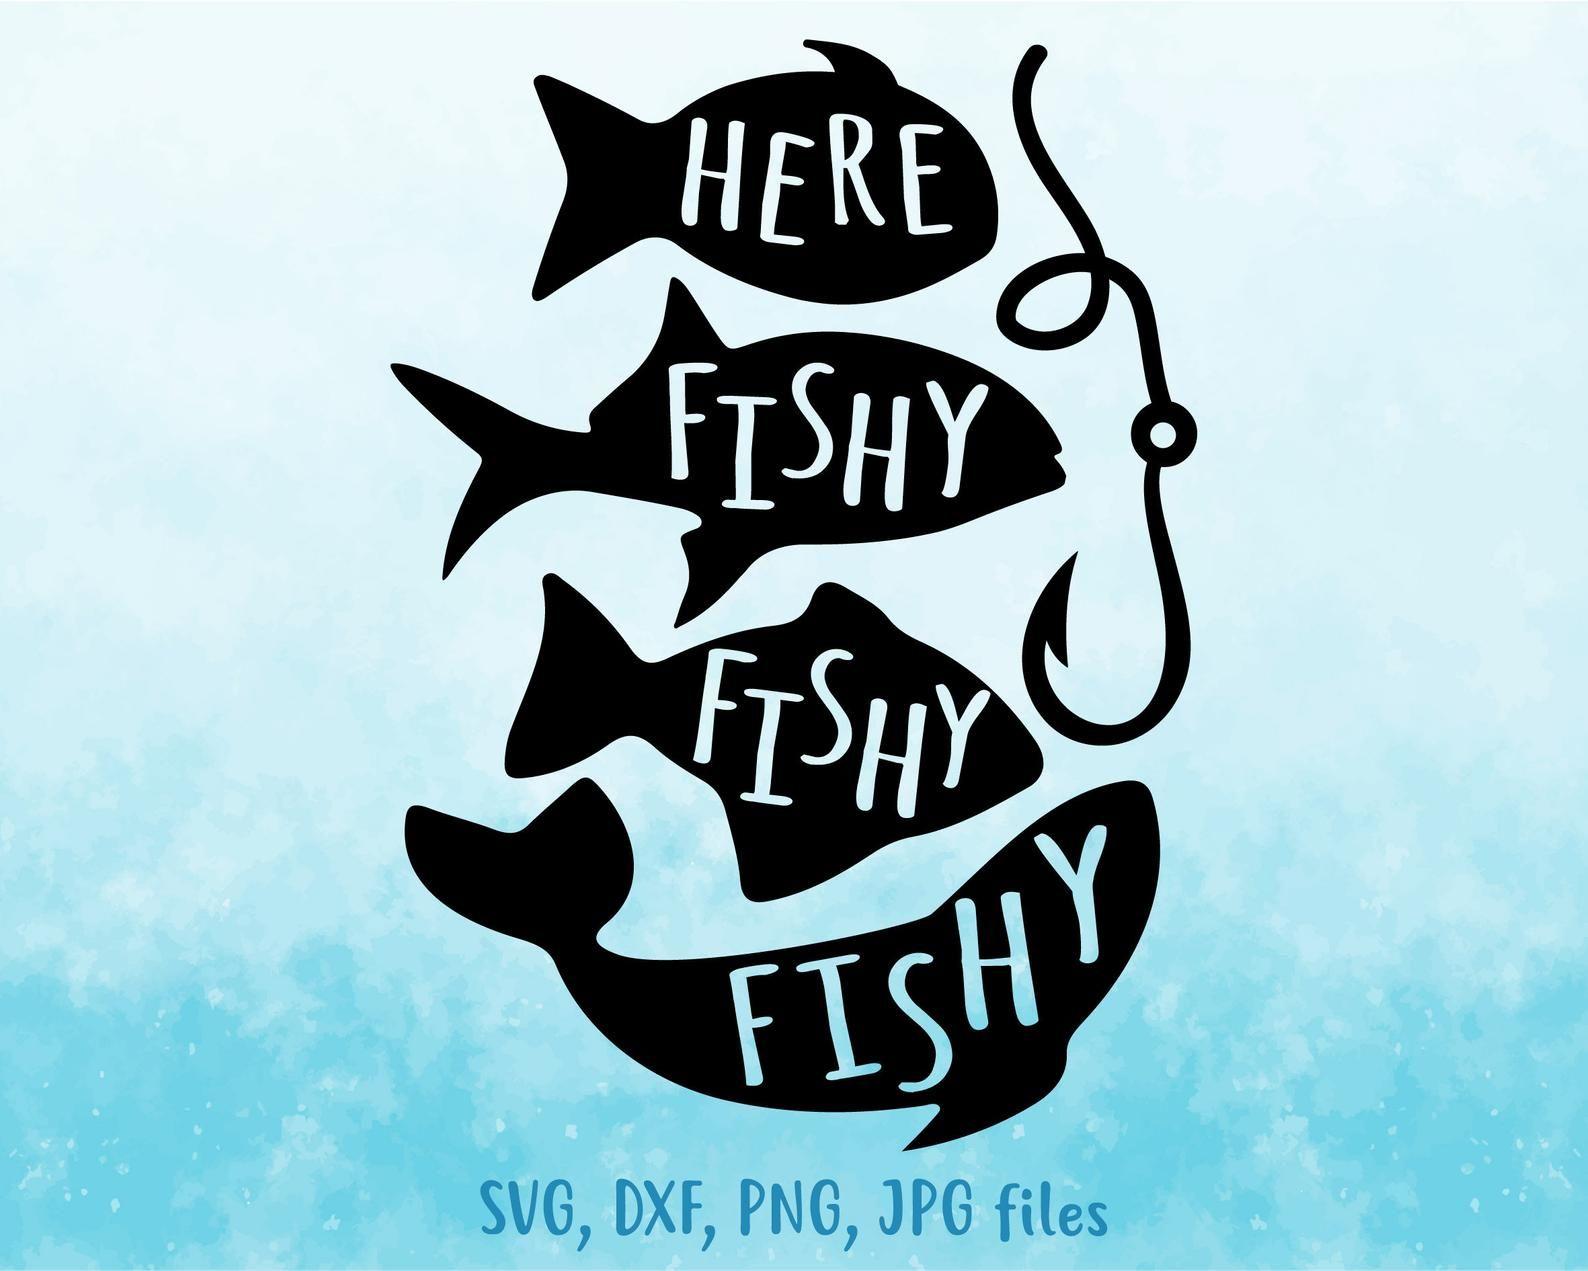 Download Here Fishy Fishy Fishy Svg Fishing Svg Summer Svg Vacation Etsy In 2021 Fishing Svg Fishing Decals Fishing Humor